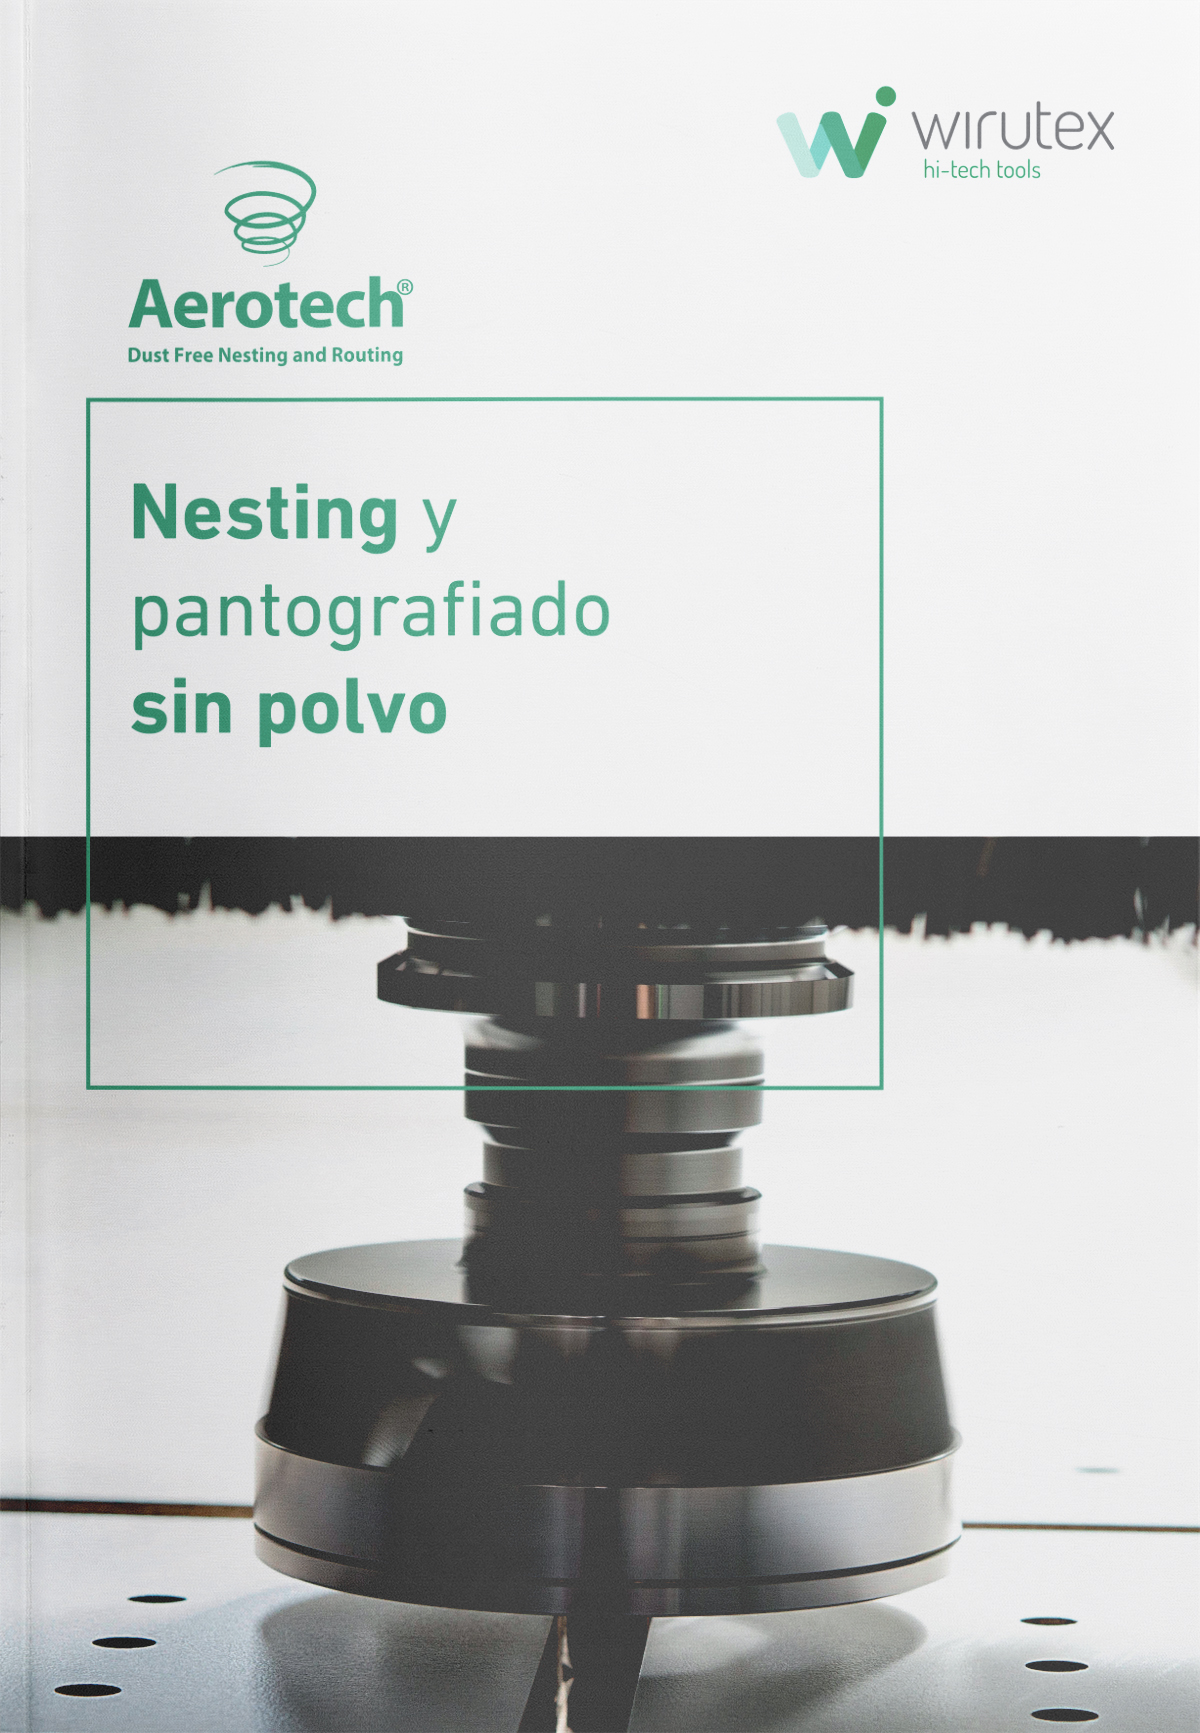 Wirutex_Aerotech_mar20_SPA